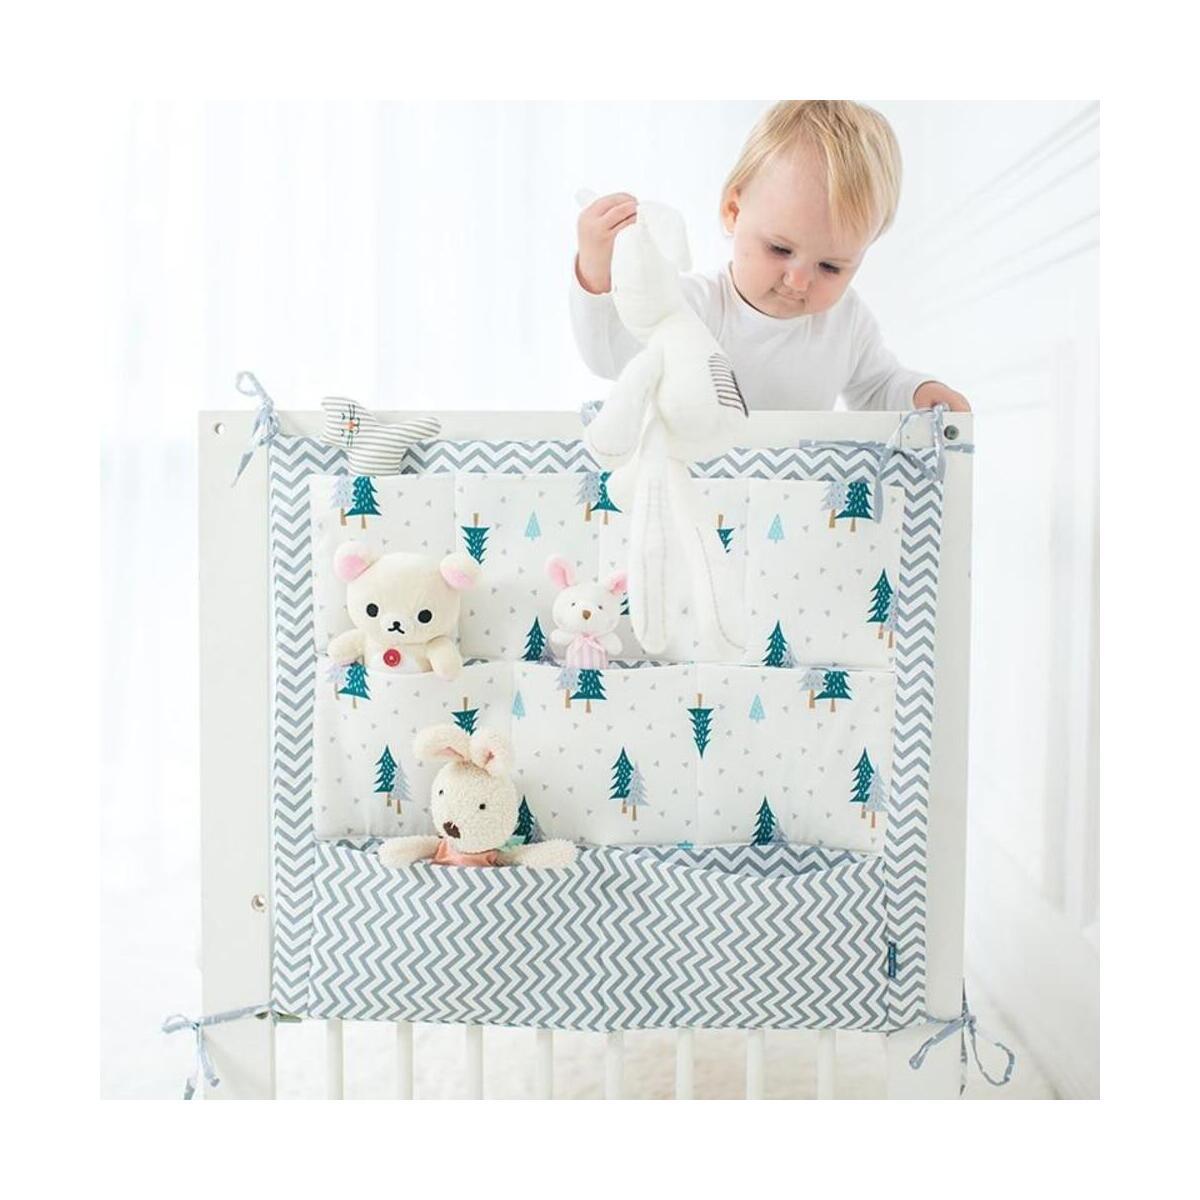 Baby Cot Bed Hanging Storage Bag ,Diaper Pocket Crib Organizer Toy For Crib Bedding Set